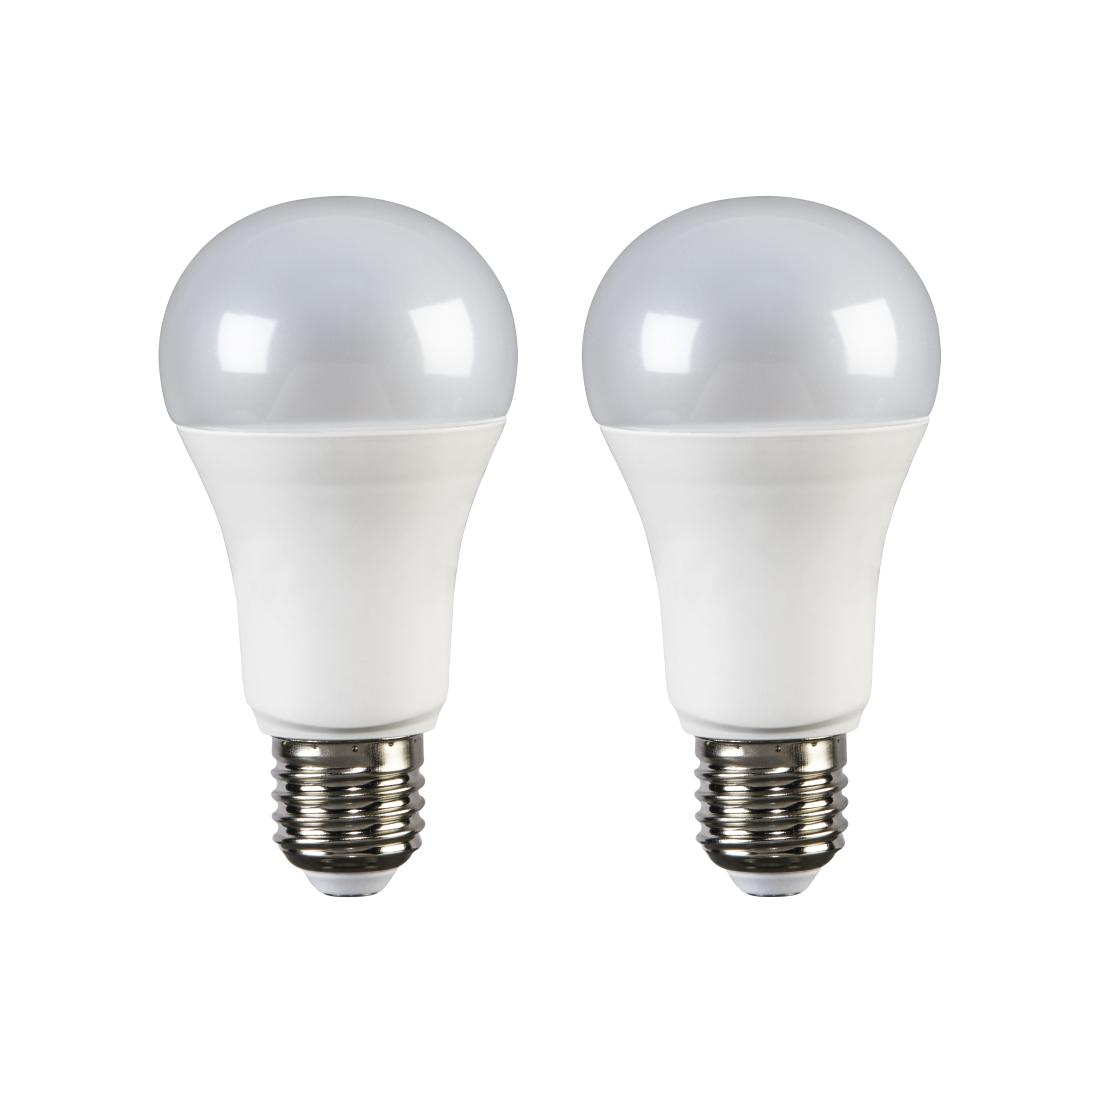 00112281 xavax led lampe e27 1521lm ersetzt 100w gl hlampe warmwei. Black Bedroom Furniture Sets. Home Design Ideas